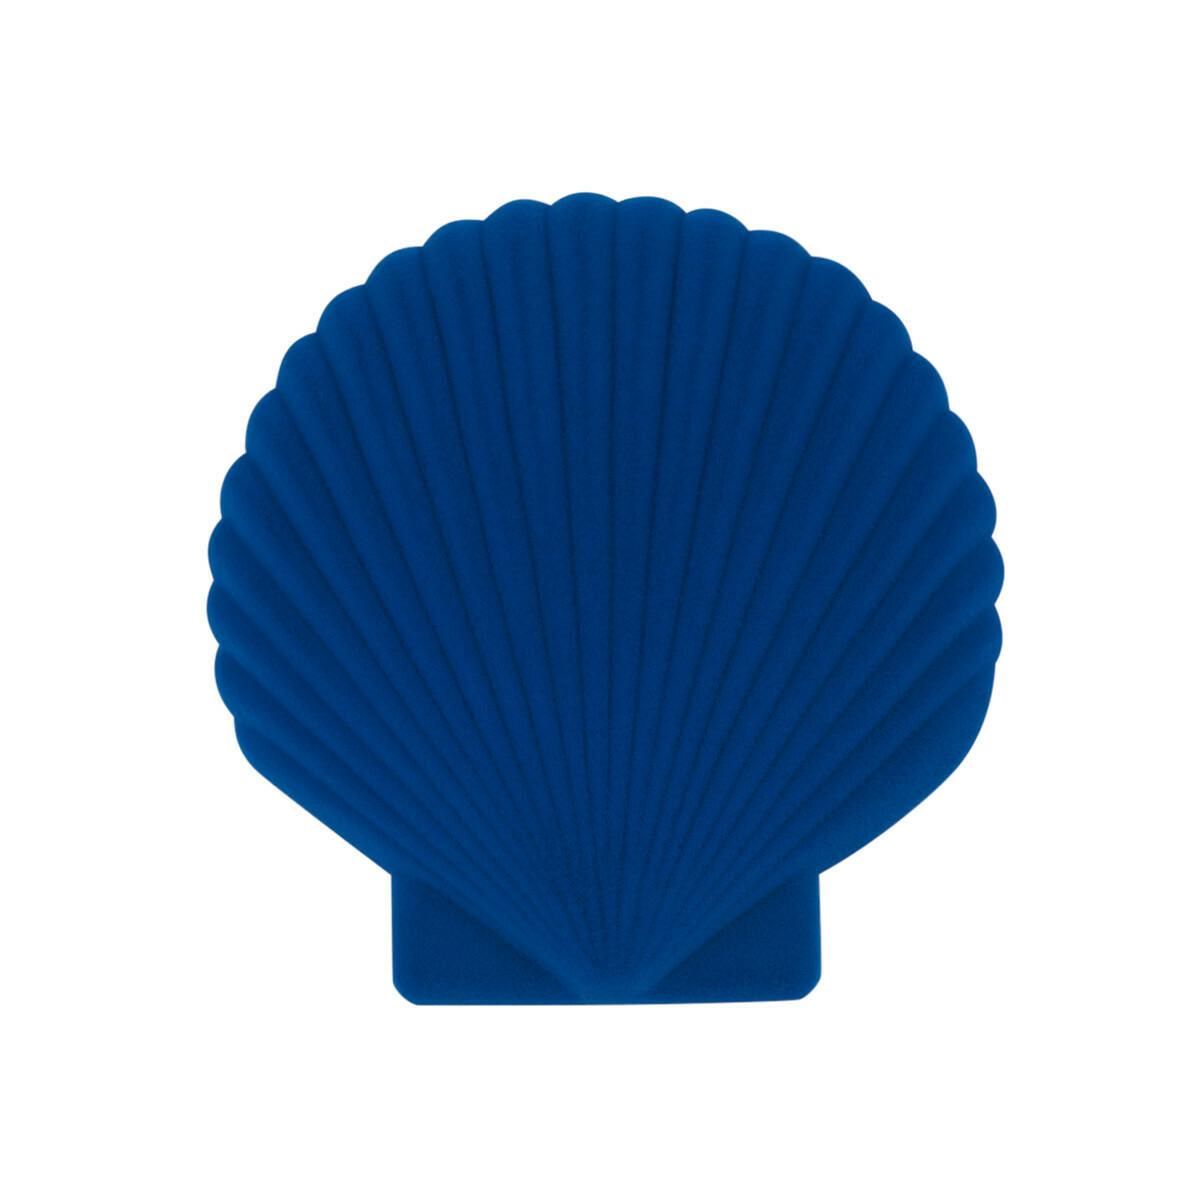 Shell Jewellery Box - Blue